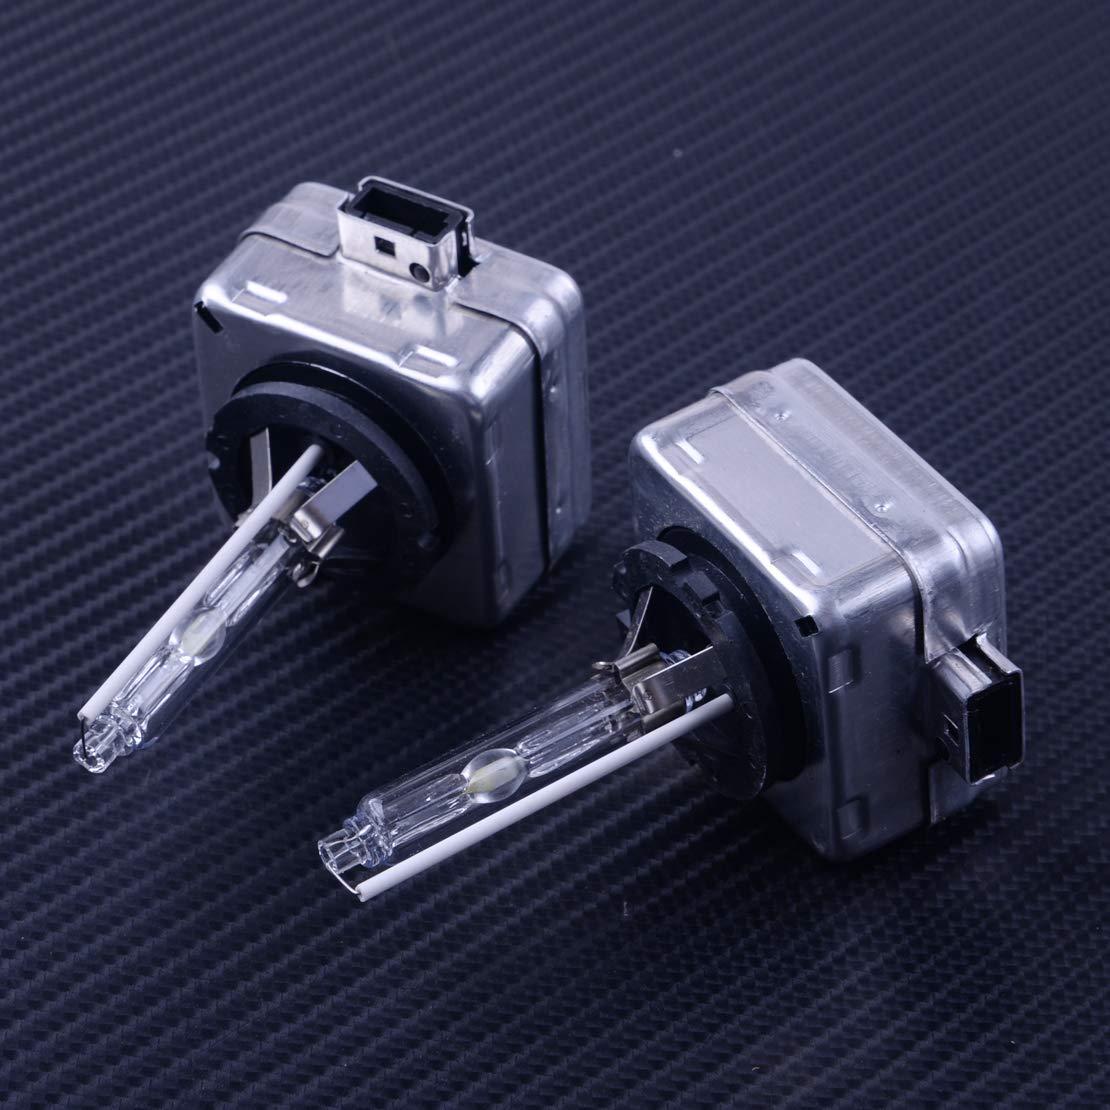 2PCS 12V 35W 9285301244 HID Xenon Headlight Bulbs Lamp Replacement D3S 6000K 3000 LM 3 pin